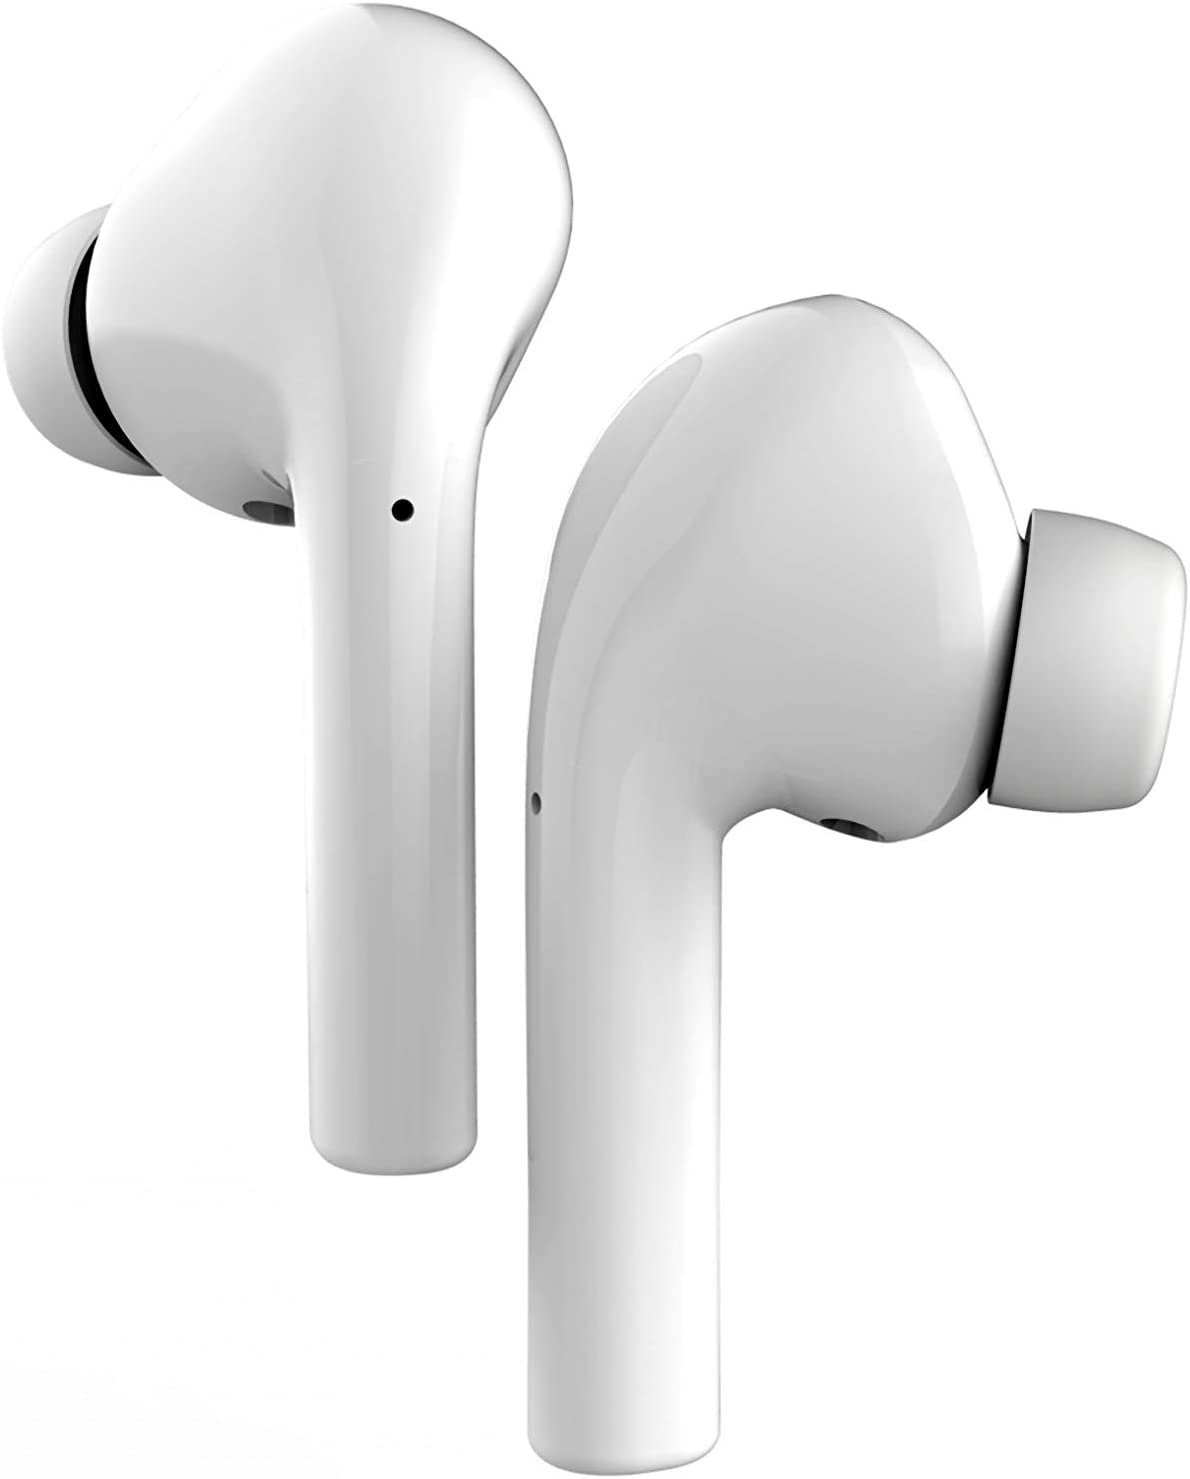 Dutch Originals White Bluetooth In Ear Headphones With Elektronik